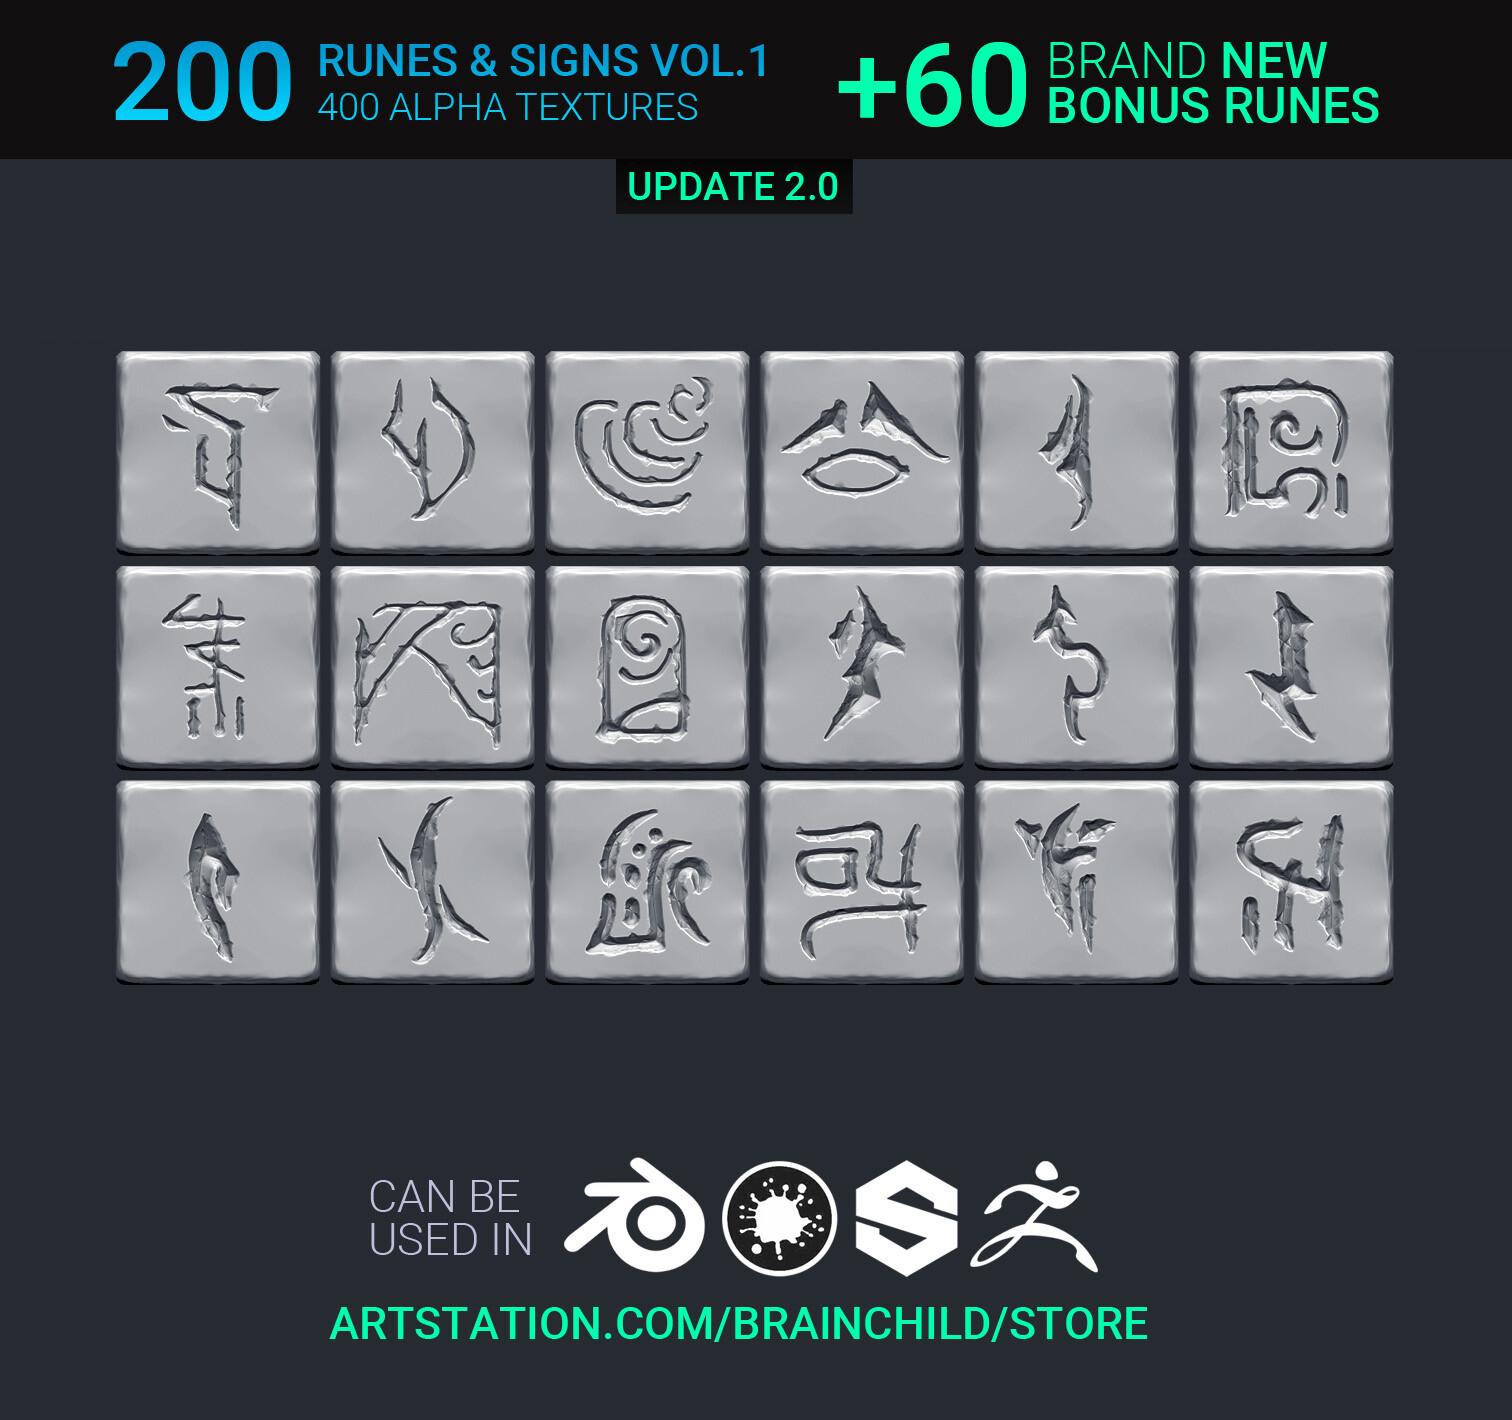 Buy it here  https://artstn.co/m/92kL | VOL.1 – 260 Runes/Symbols/Signs/Shapes (520 Alpha Textures)